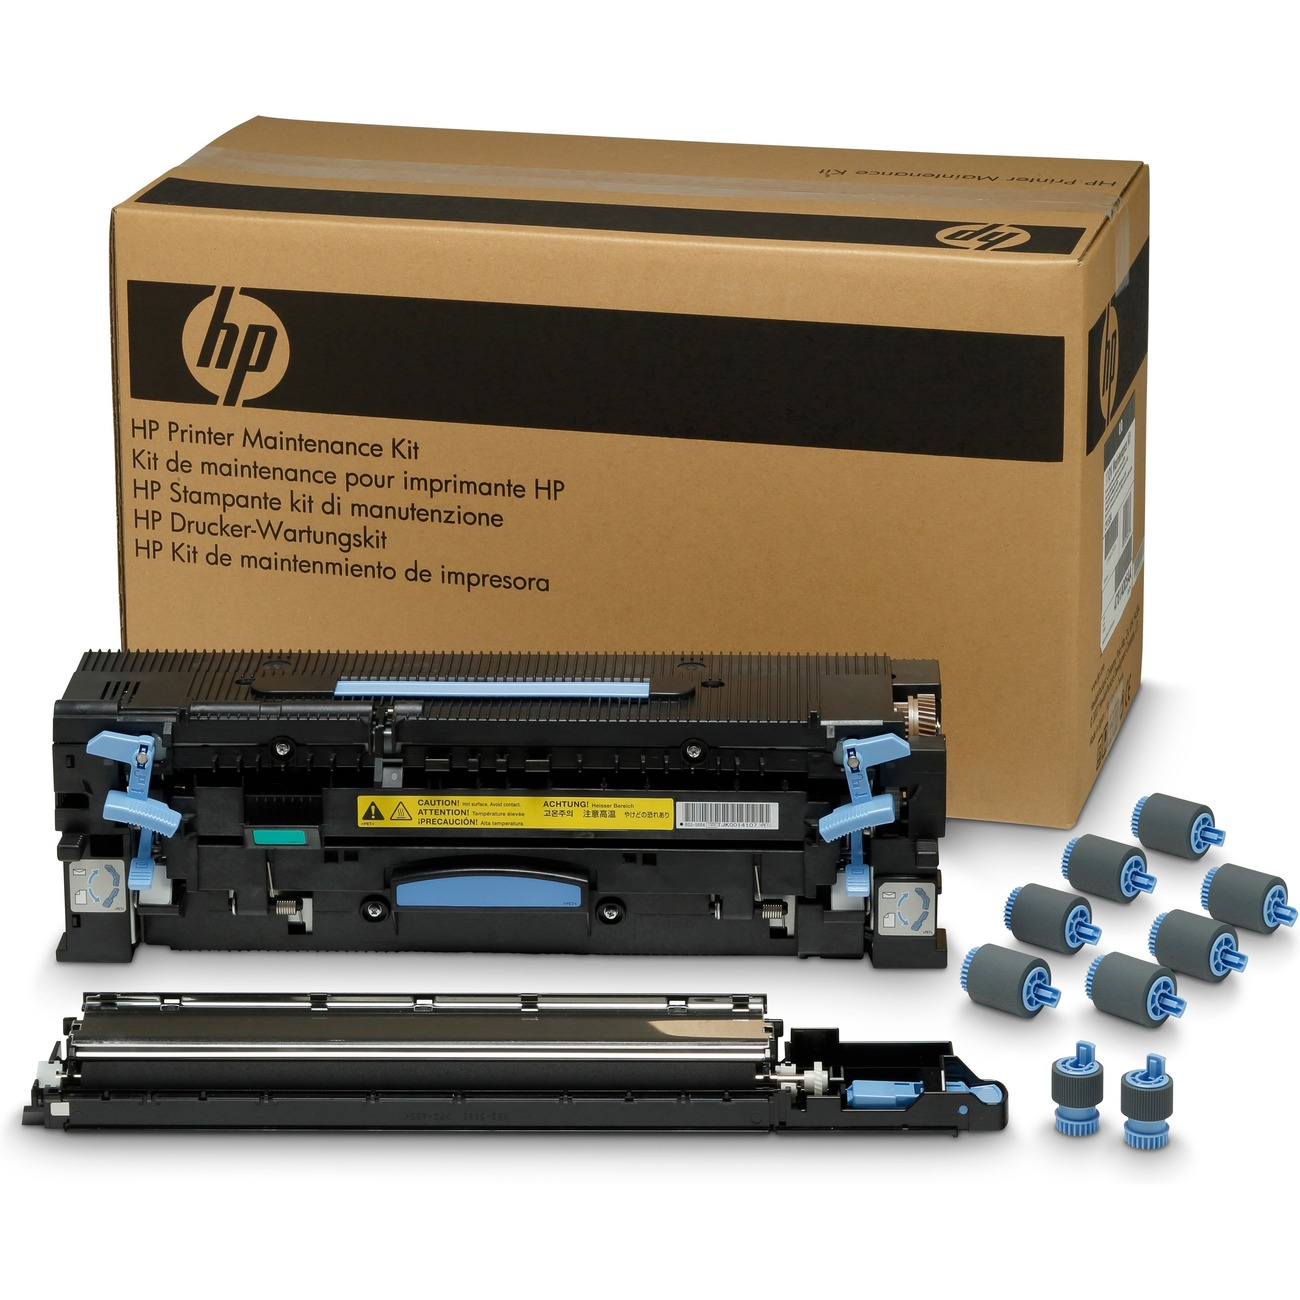 Genuine HP Maintenance Kit LaserJet 9000 110V 350000 PG For LaserJet LJ 9000 9040 9050 Series C9152A